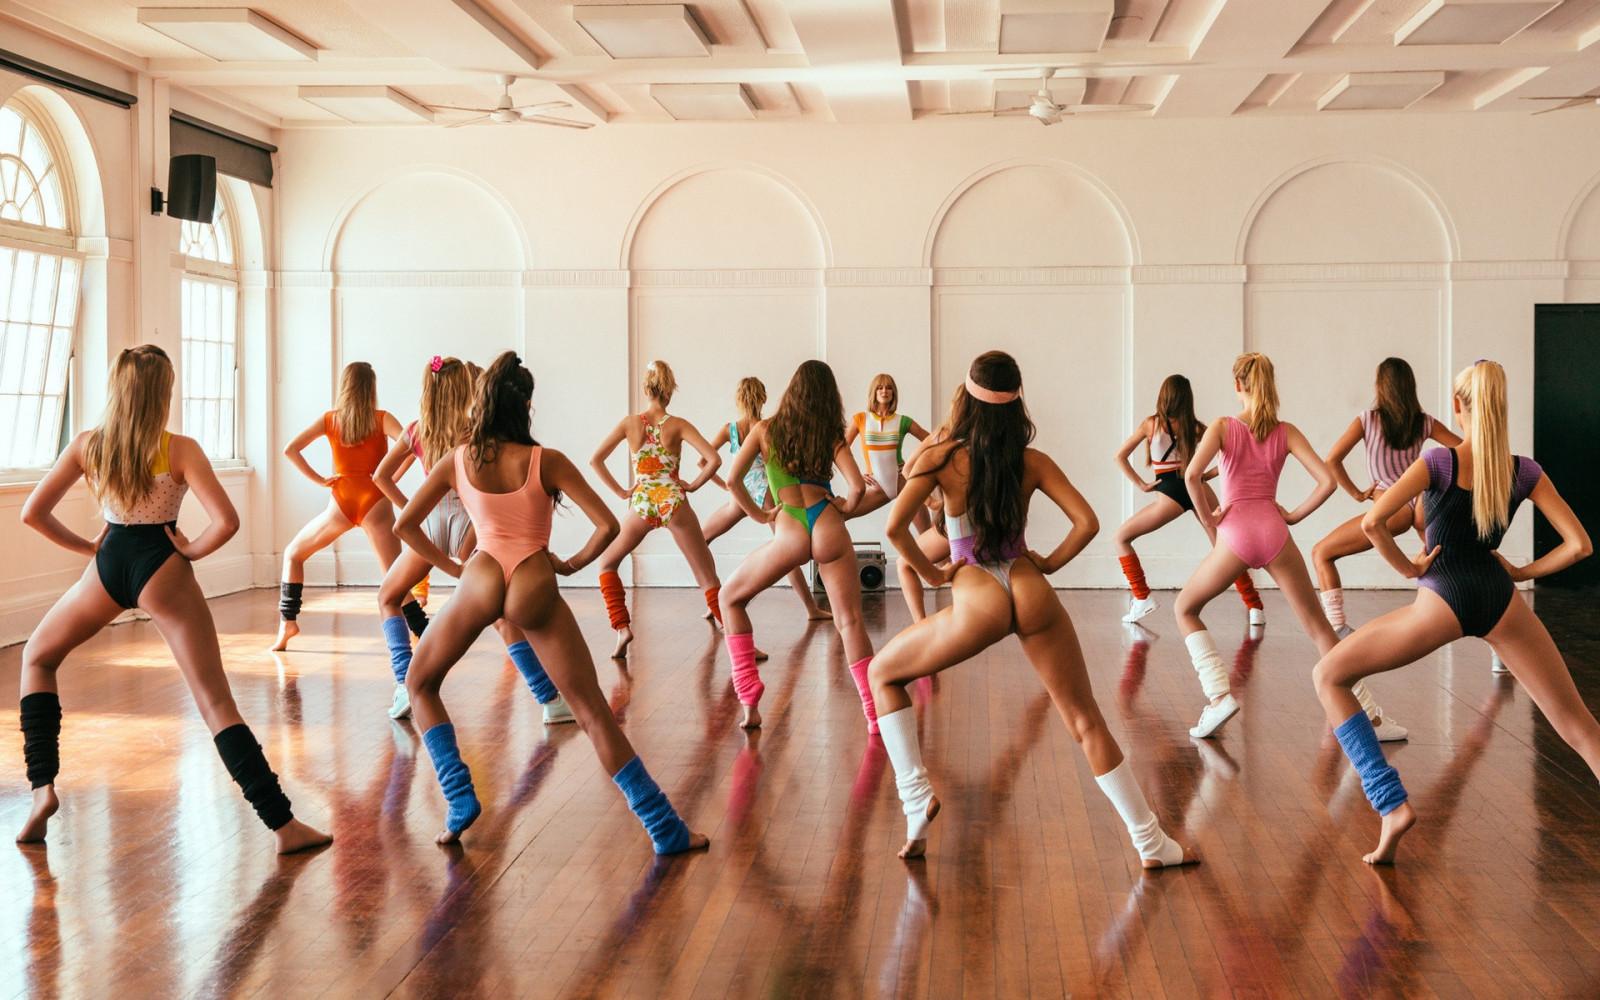 Sports nude teen girls gym class toon